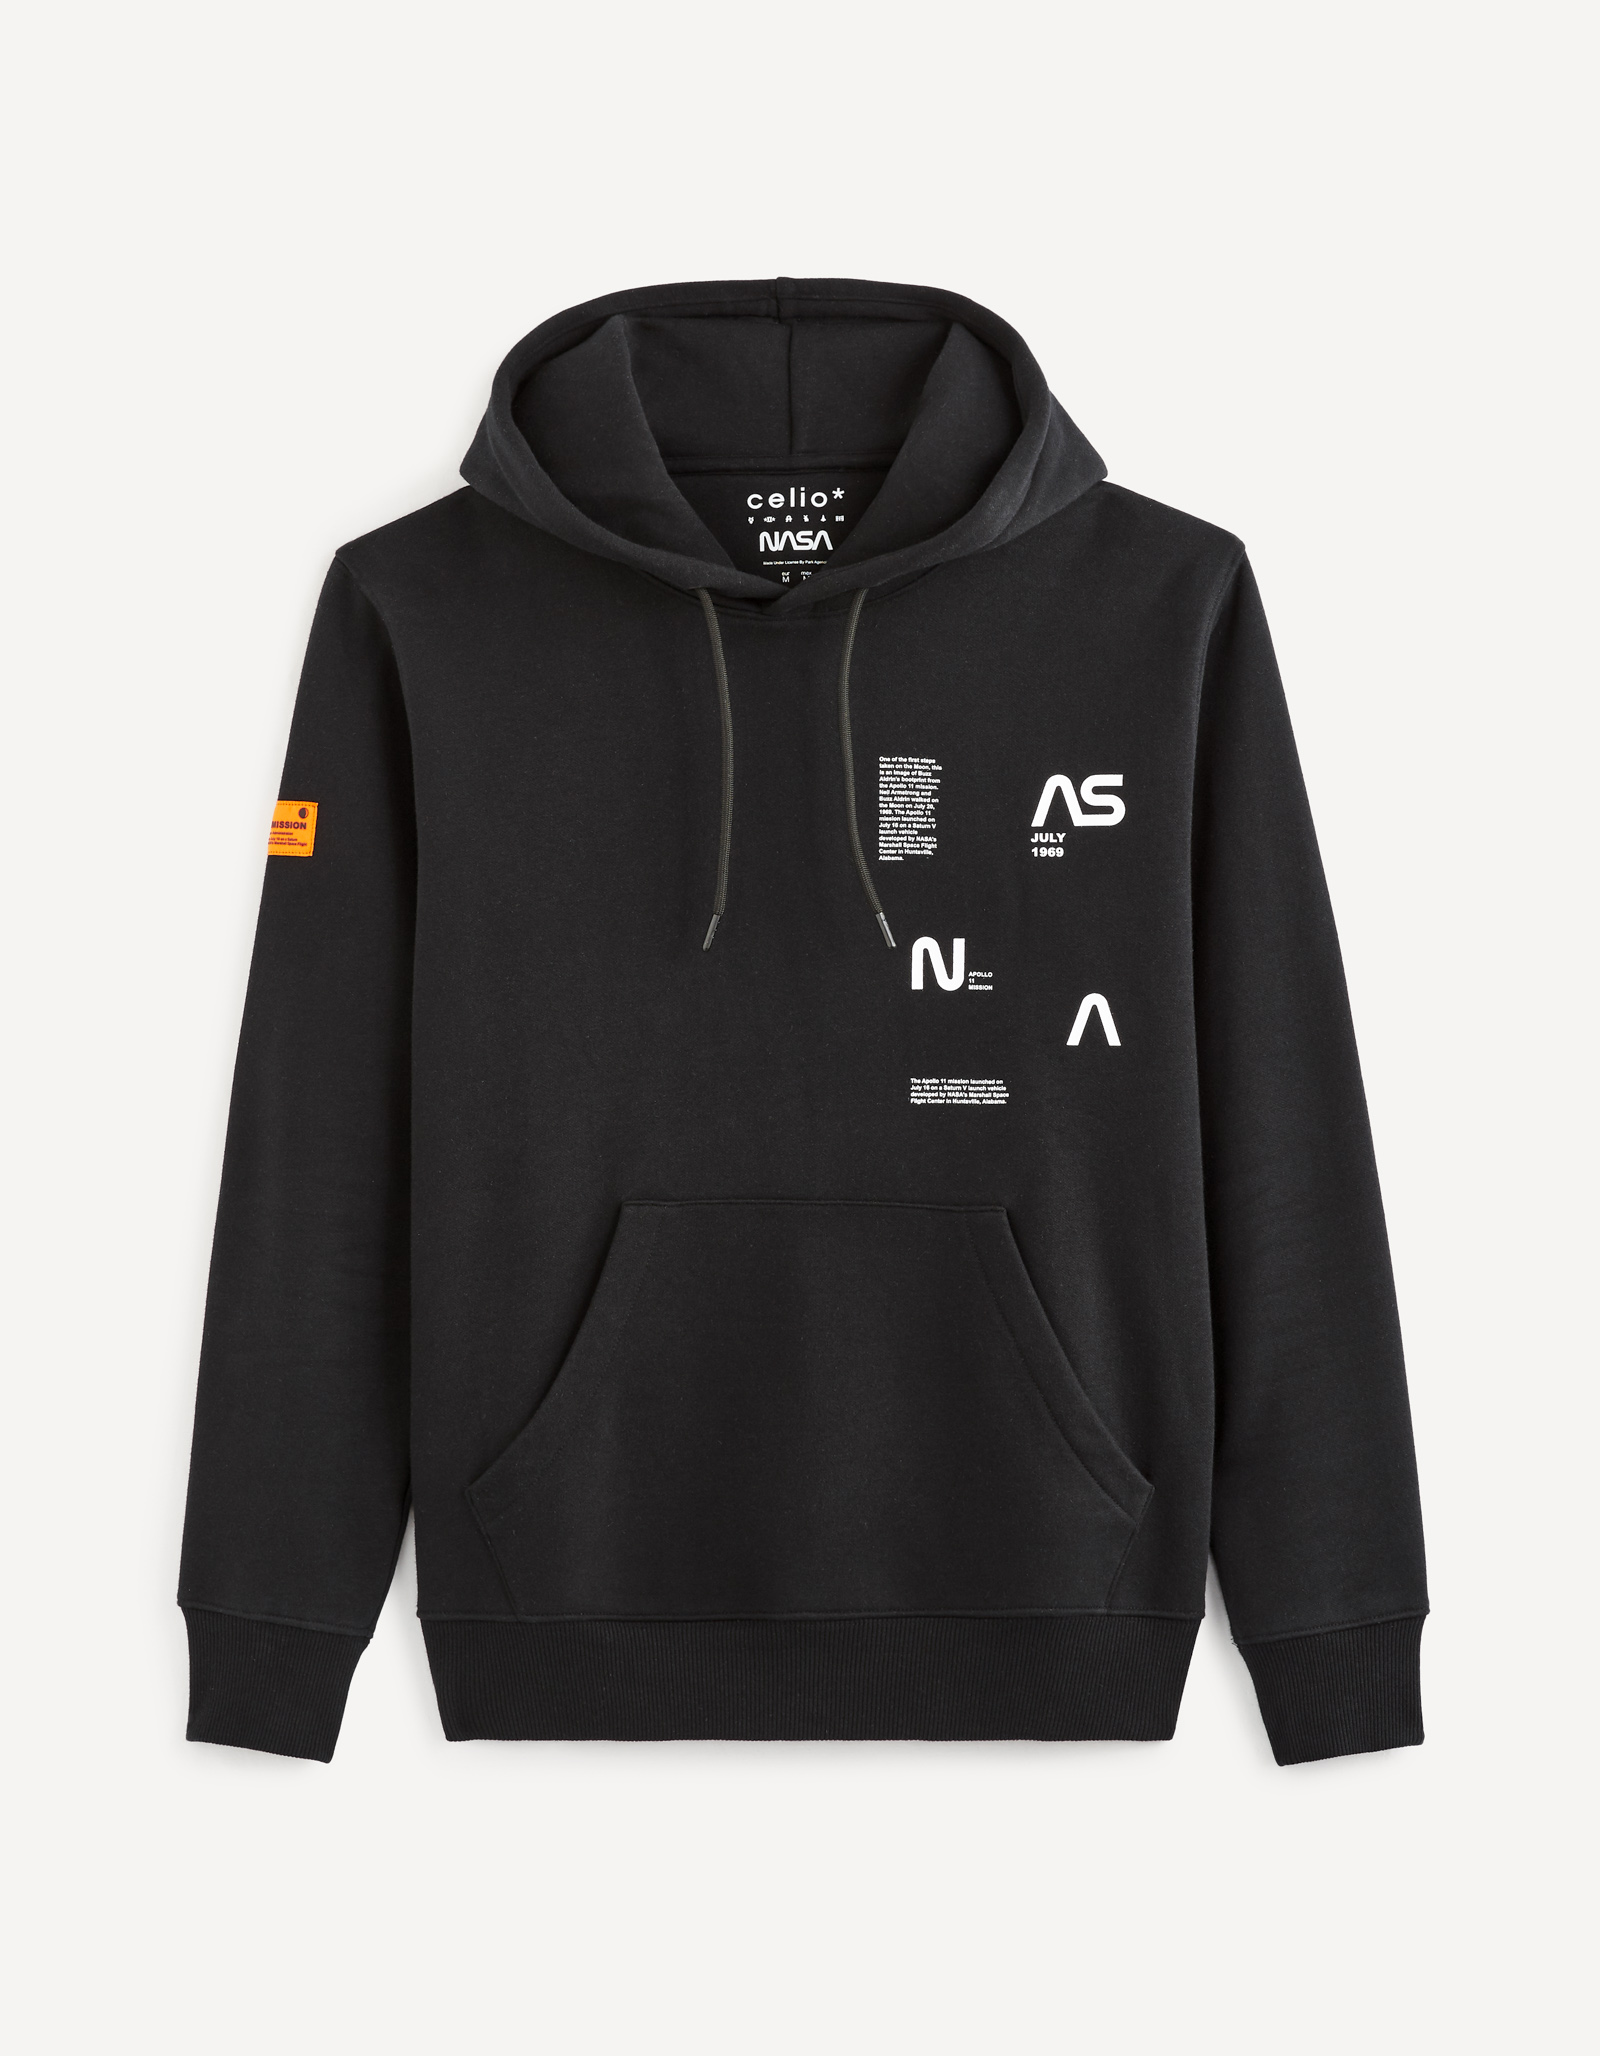 celio | NASA - Black hooded Sweatshirt